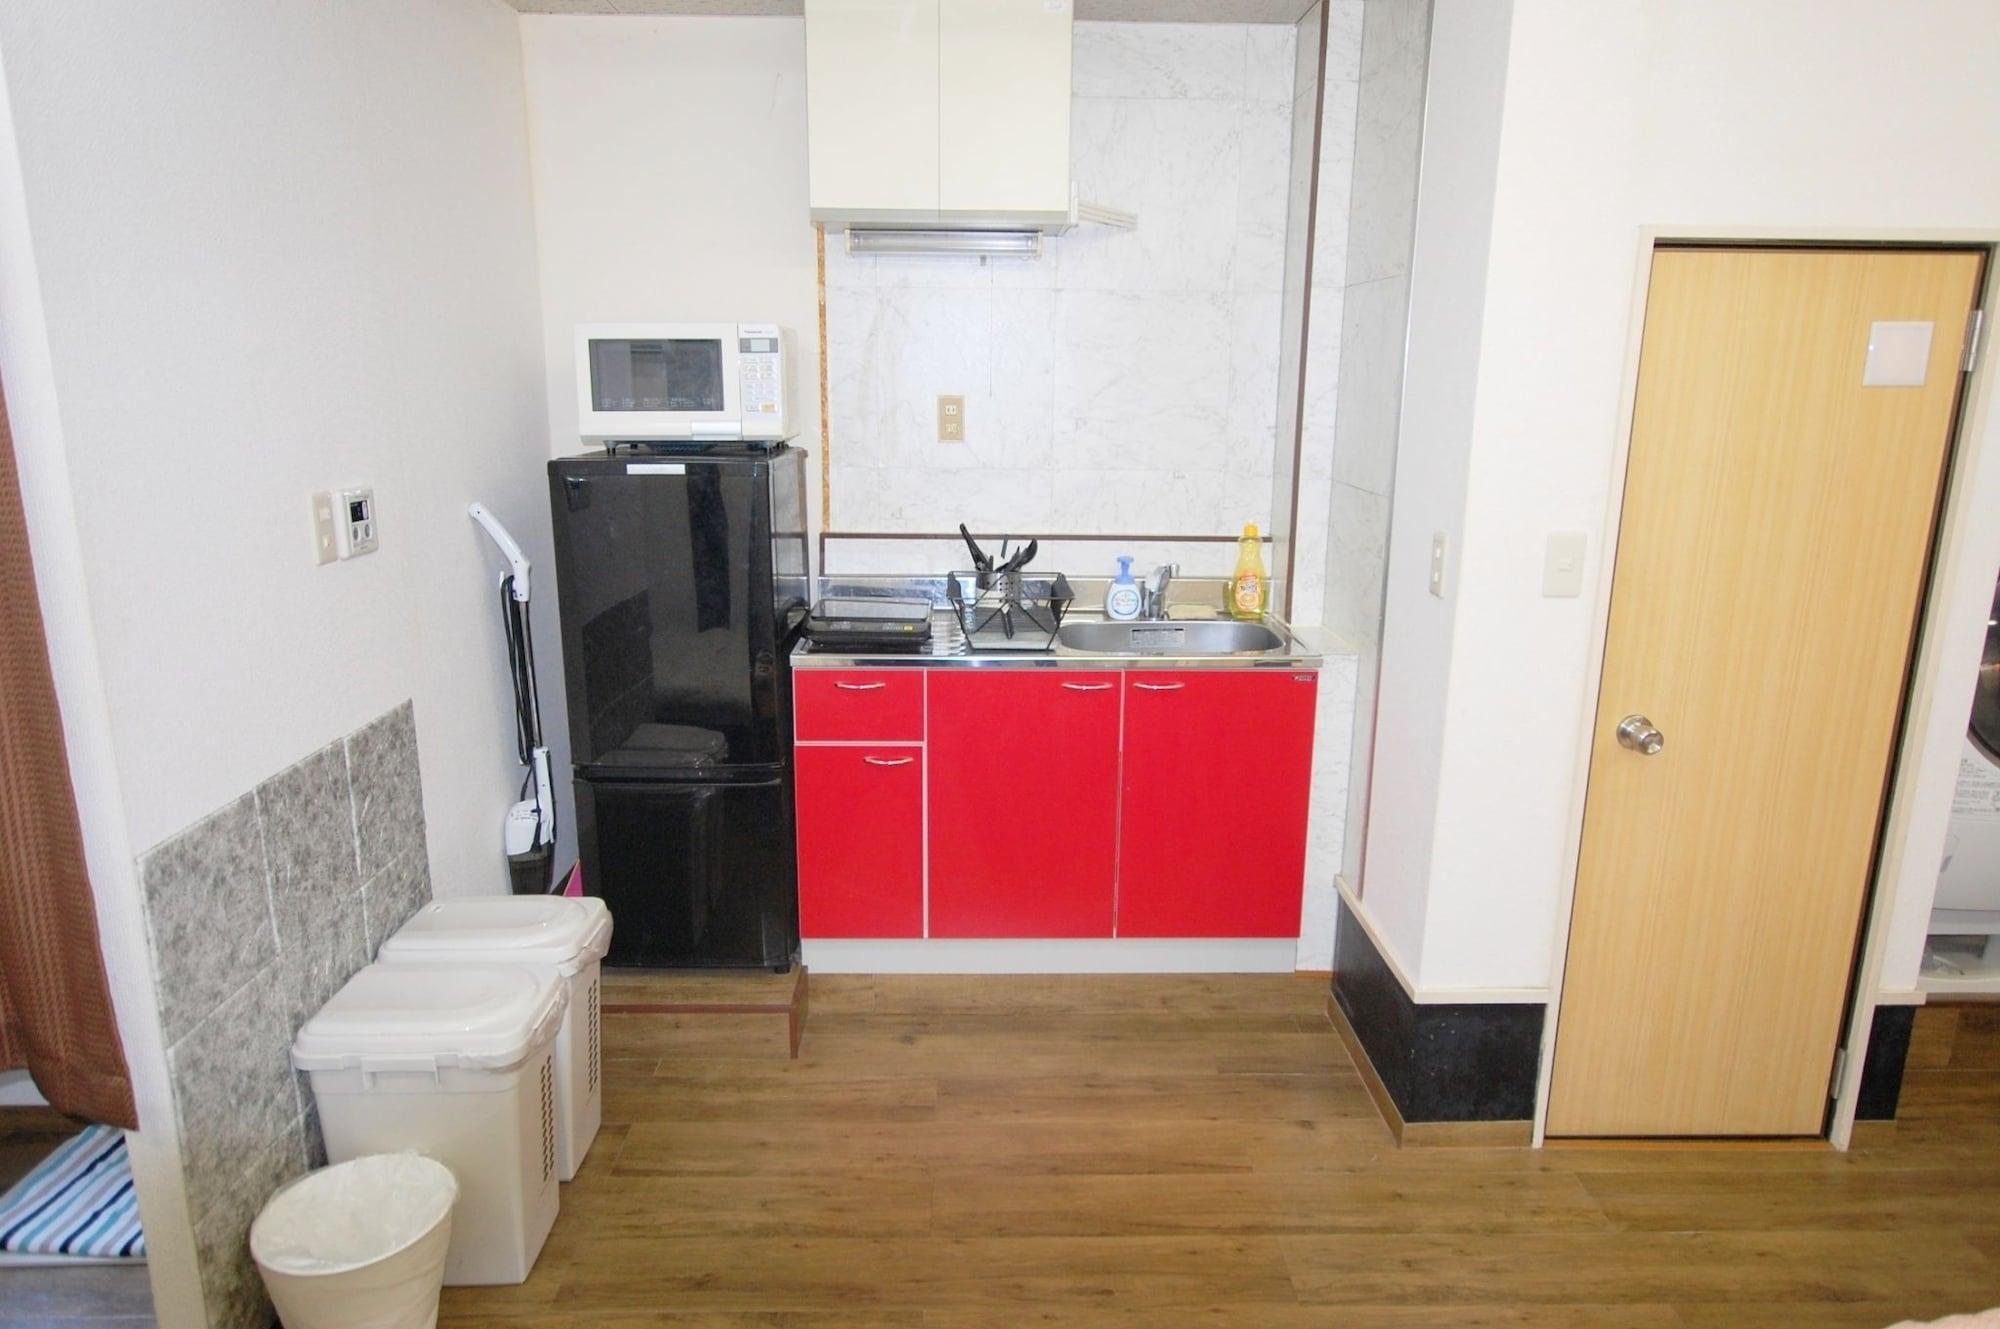 East Shinagawa Apartment, Shinagawa